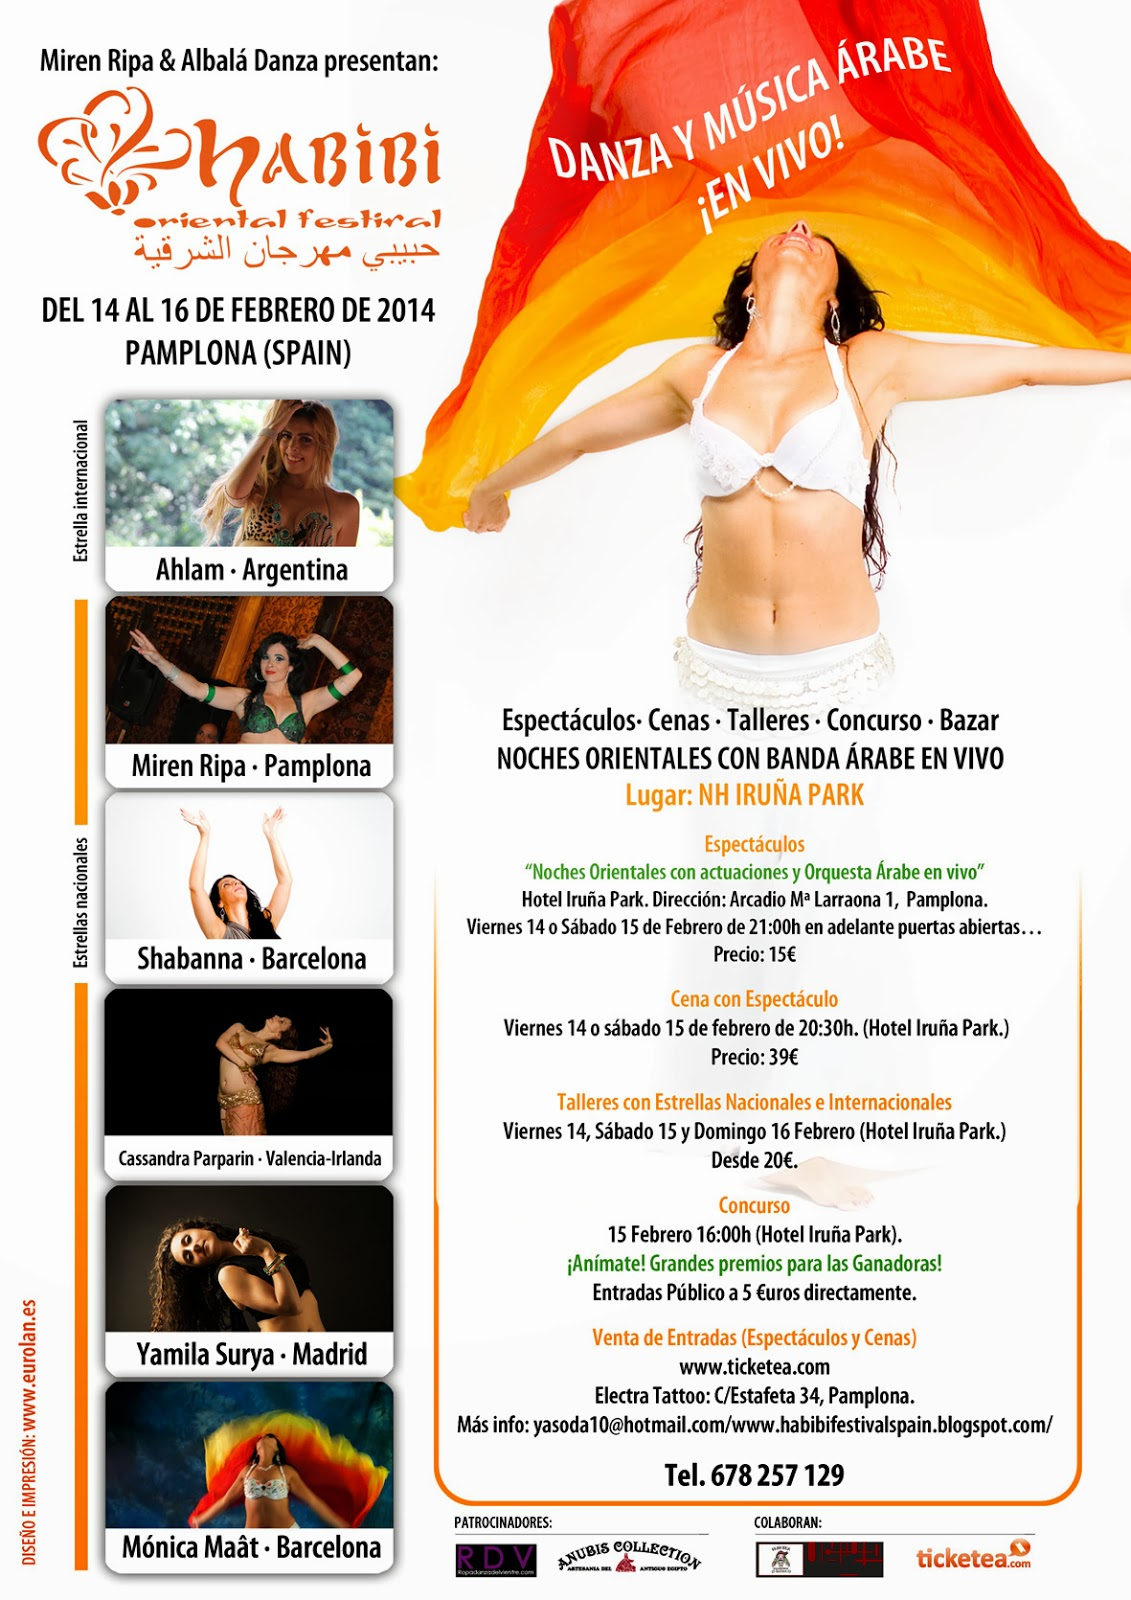 Concurso Habibi Oriental Festival con Miren Ripa & Albalá Danza en Panplona